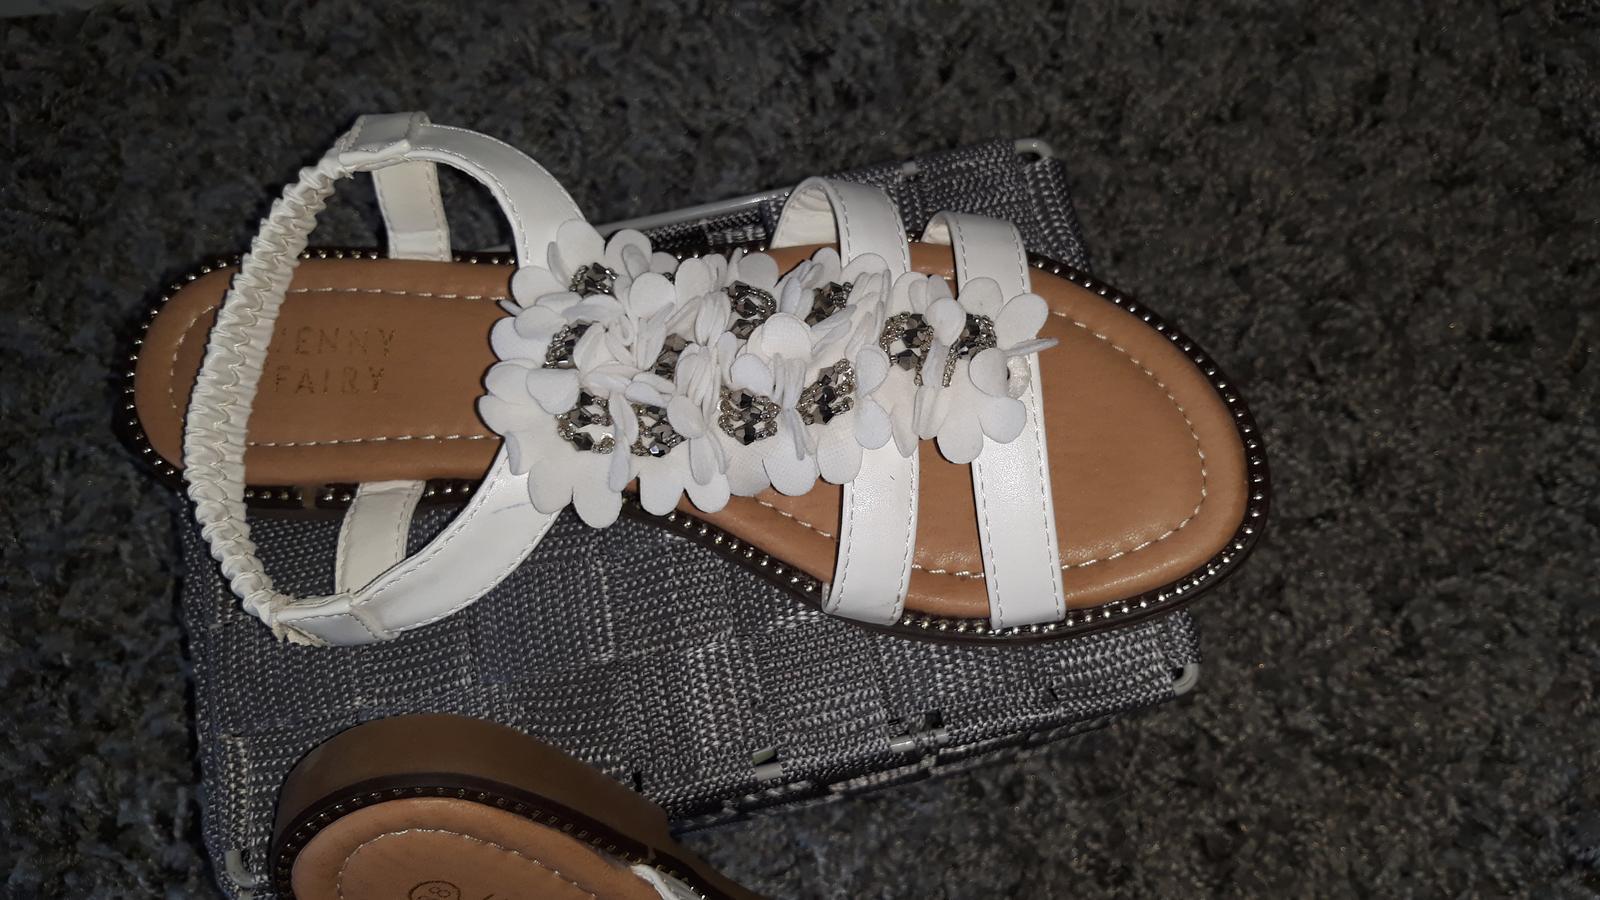 Biele sandálky - Obrázok č. 2